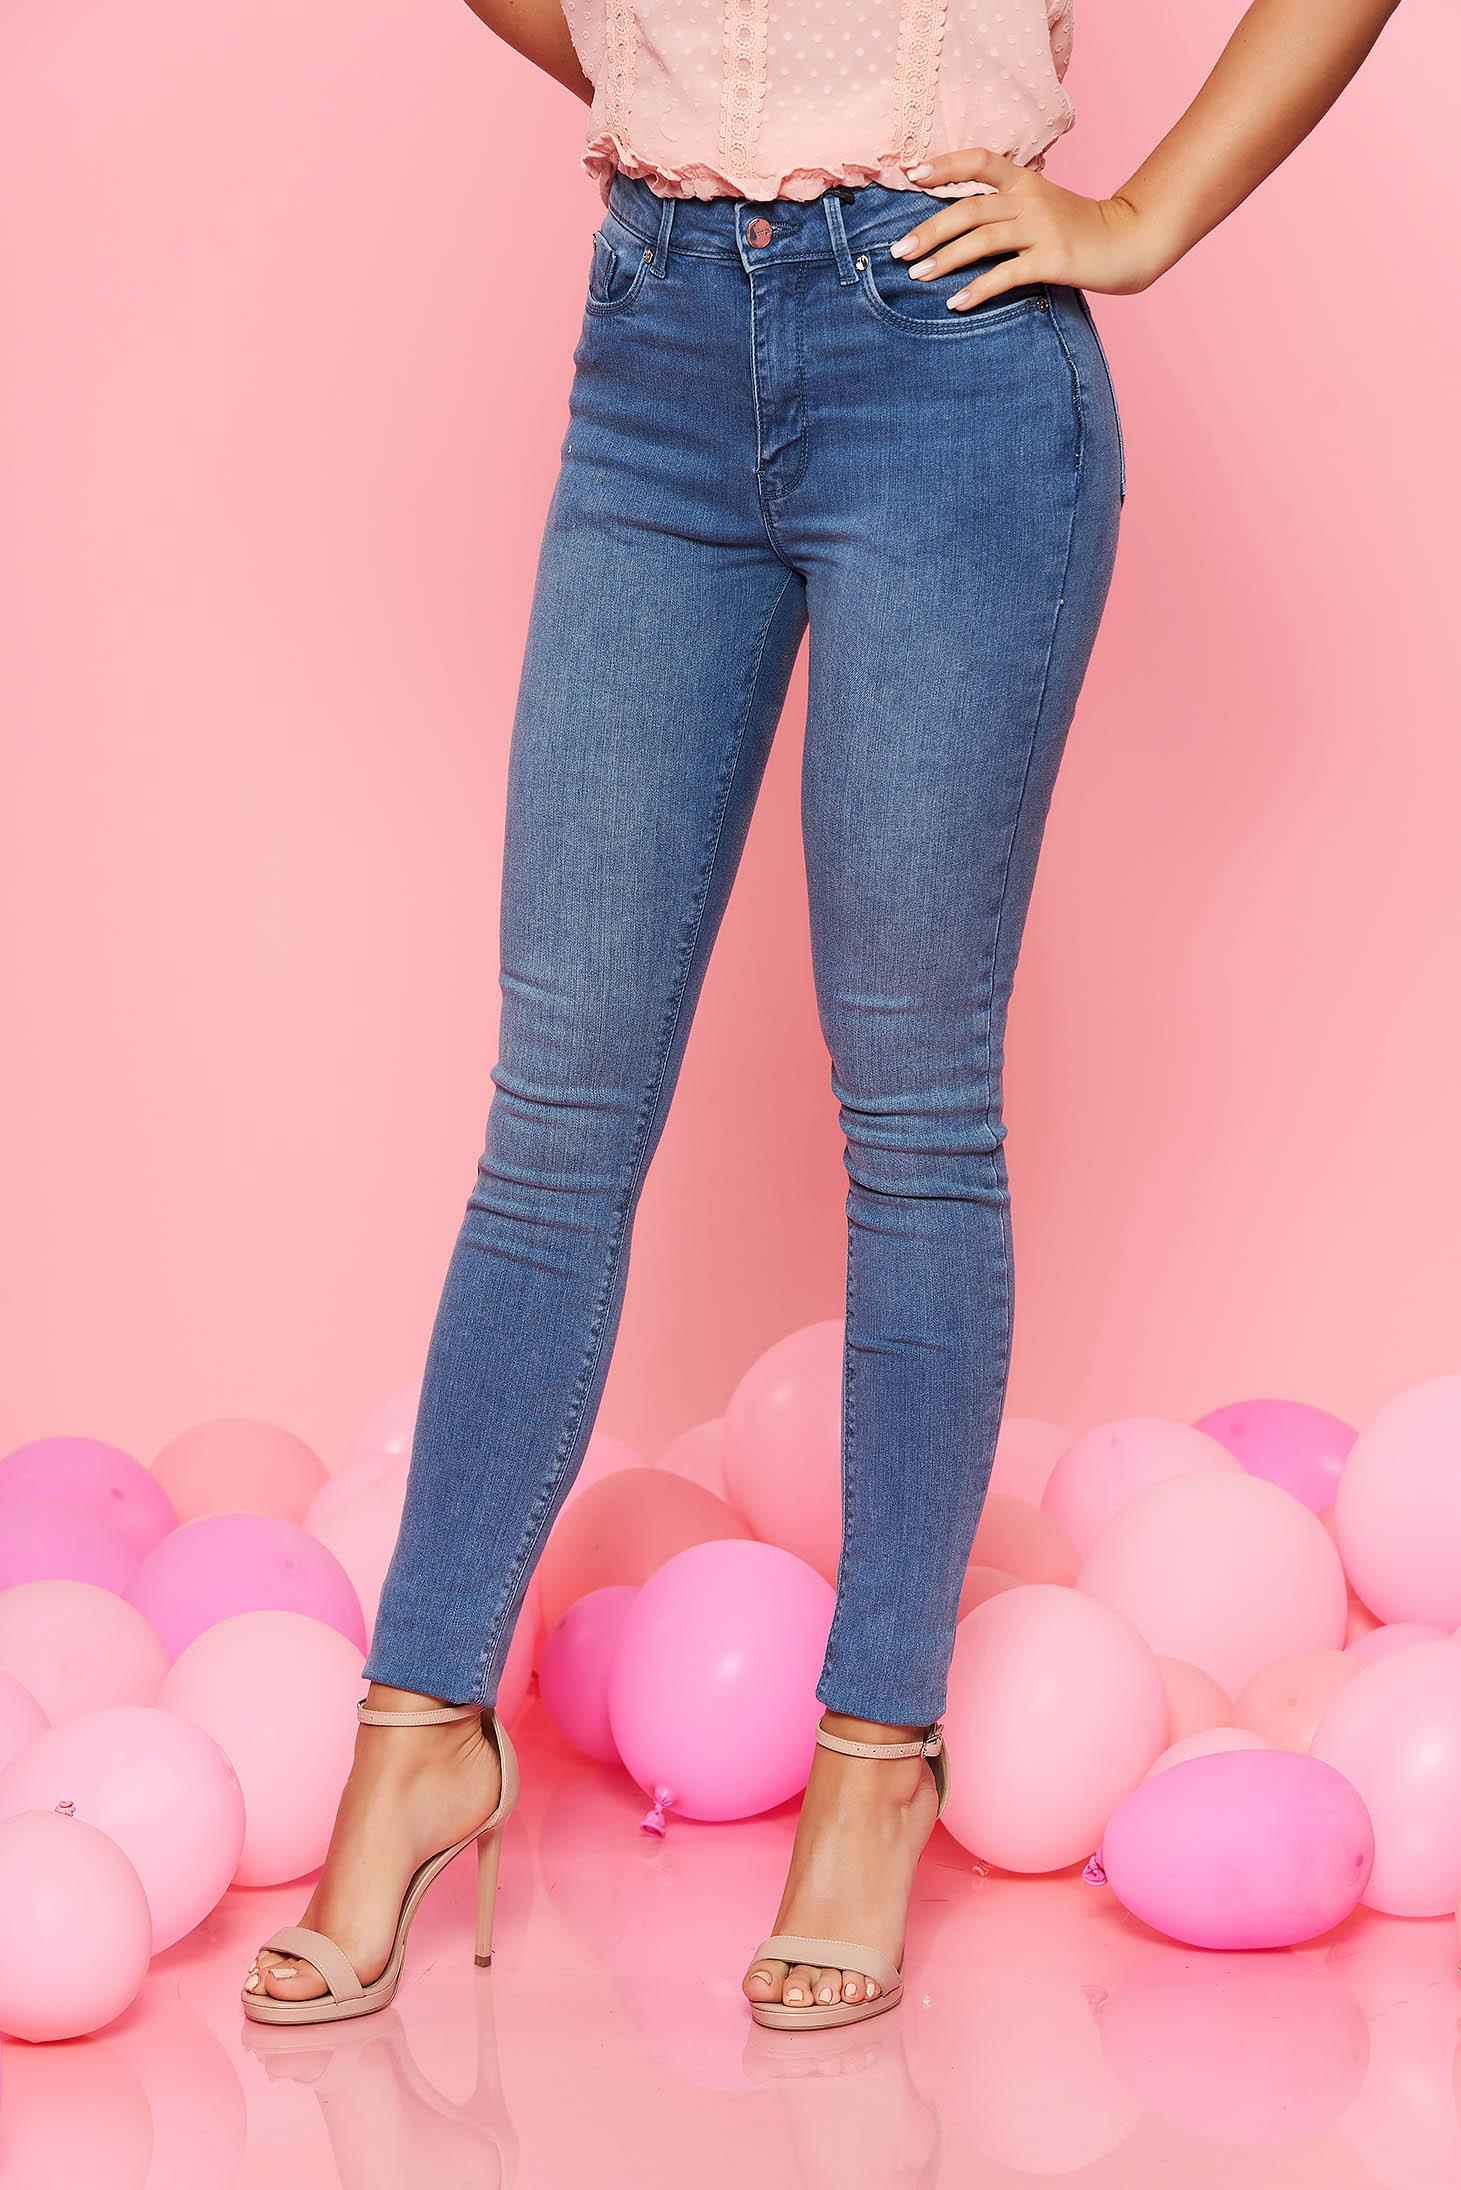 Top Secret lightblue skinny jeans with medium waist slightly elastic cotton